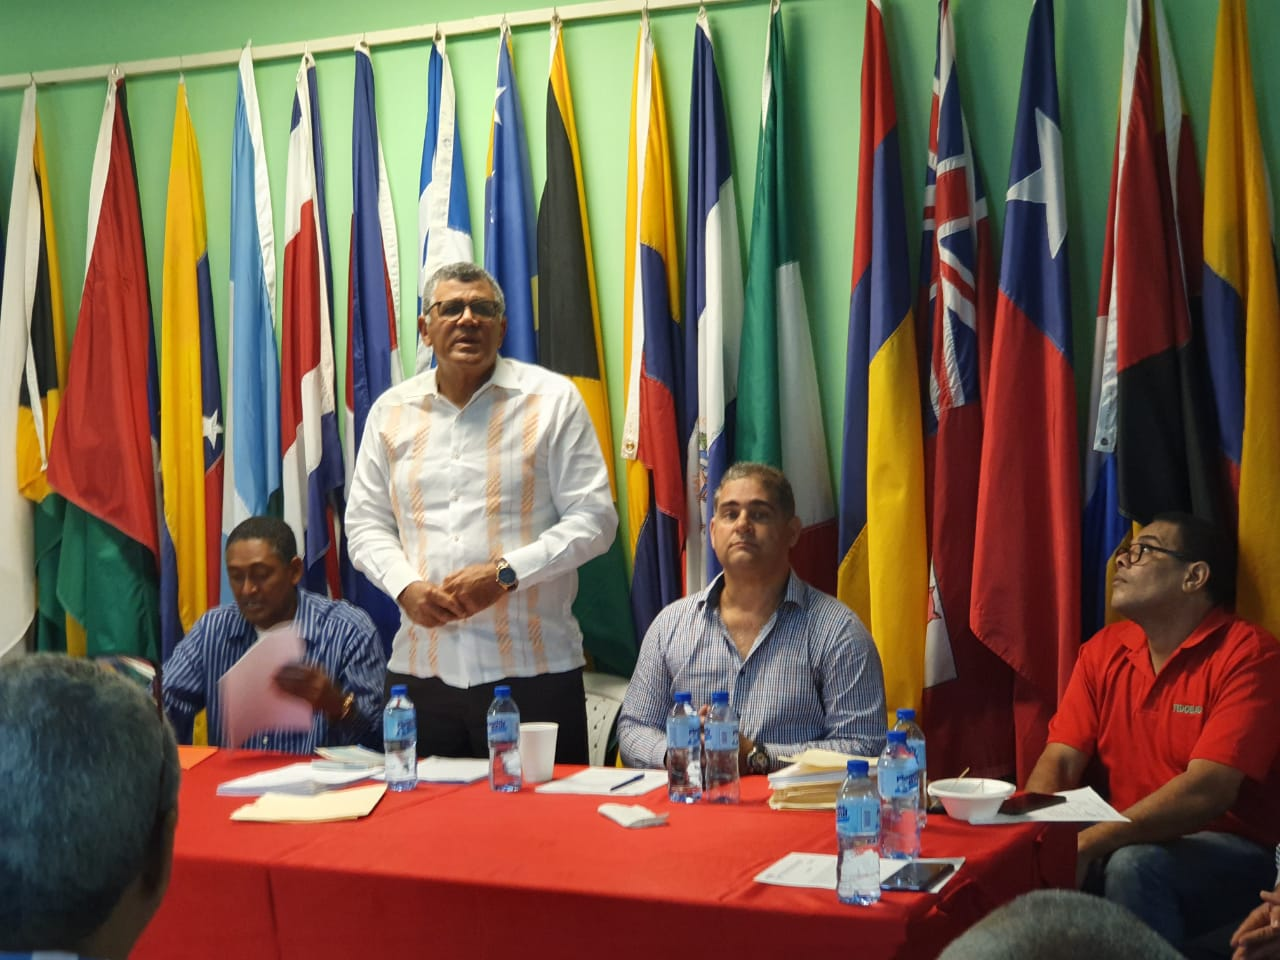 Federación de bádminton hará asamblea eleccionaria en febrero